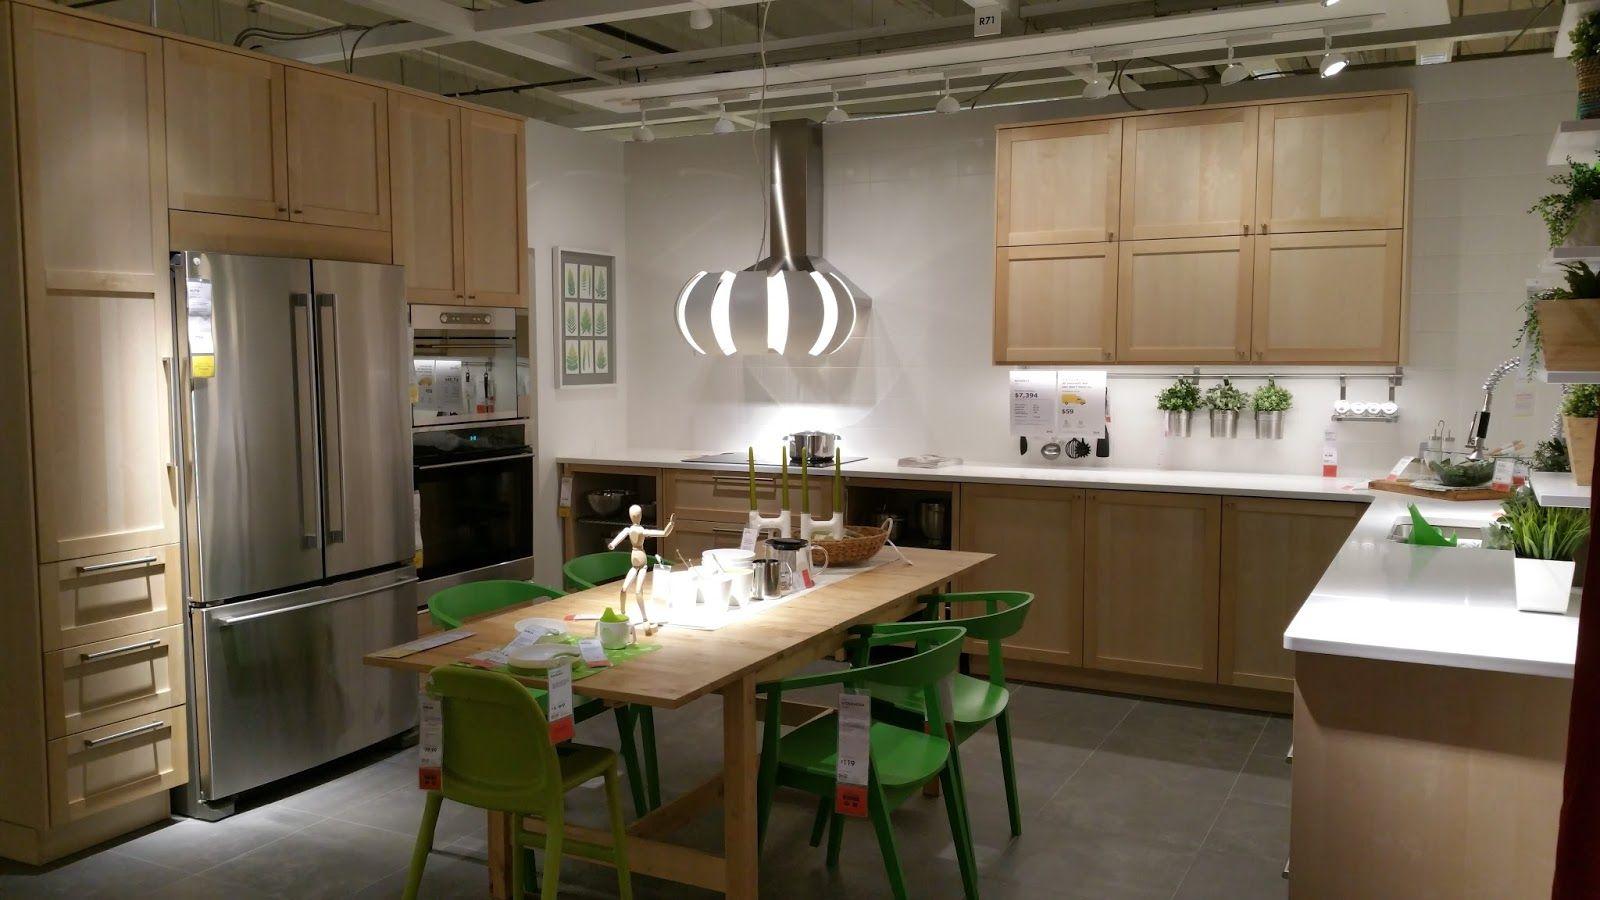 Pin de Angel Roberts en NYC Kitchen Ideas for Birch Cabinets   Pinterest